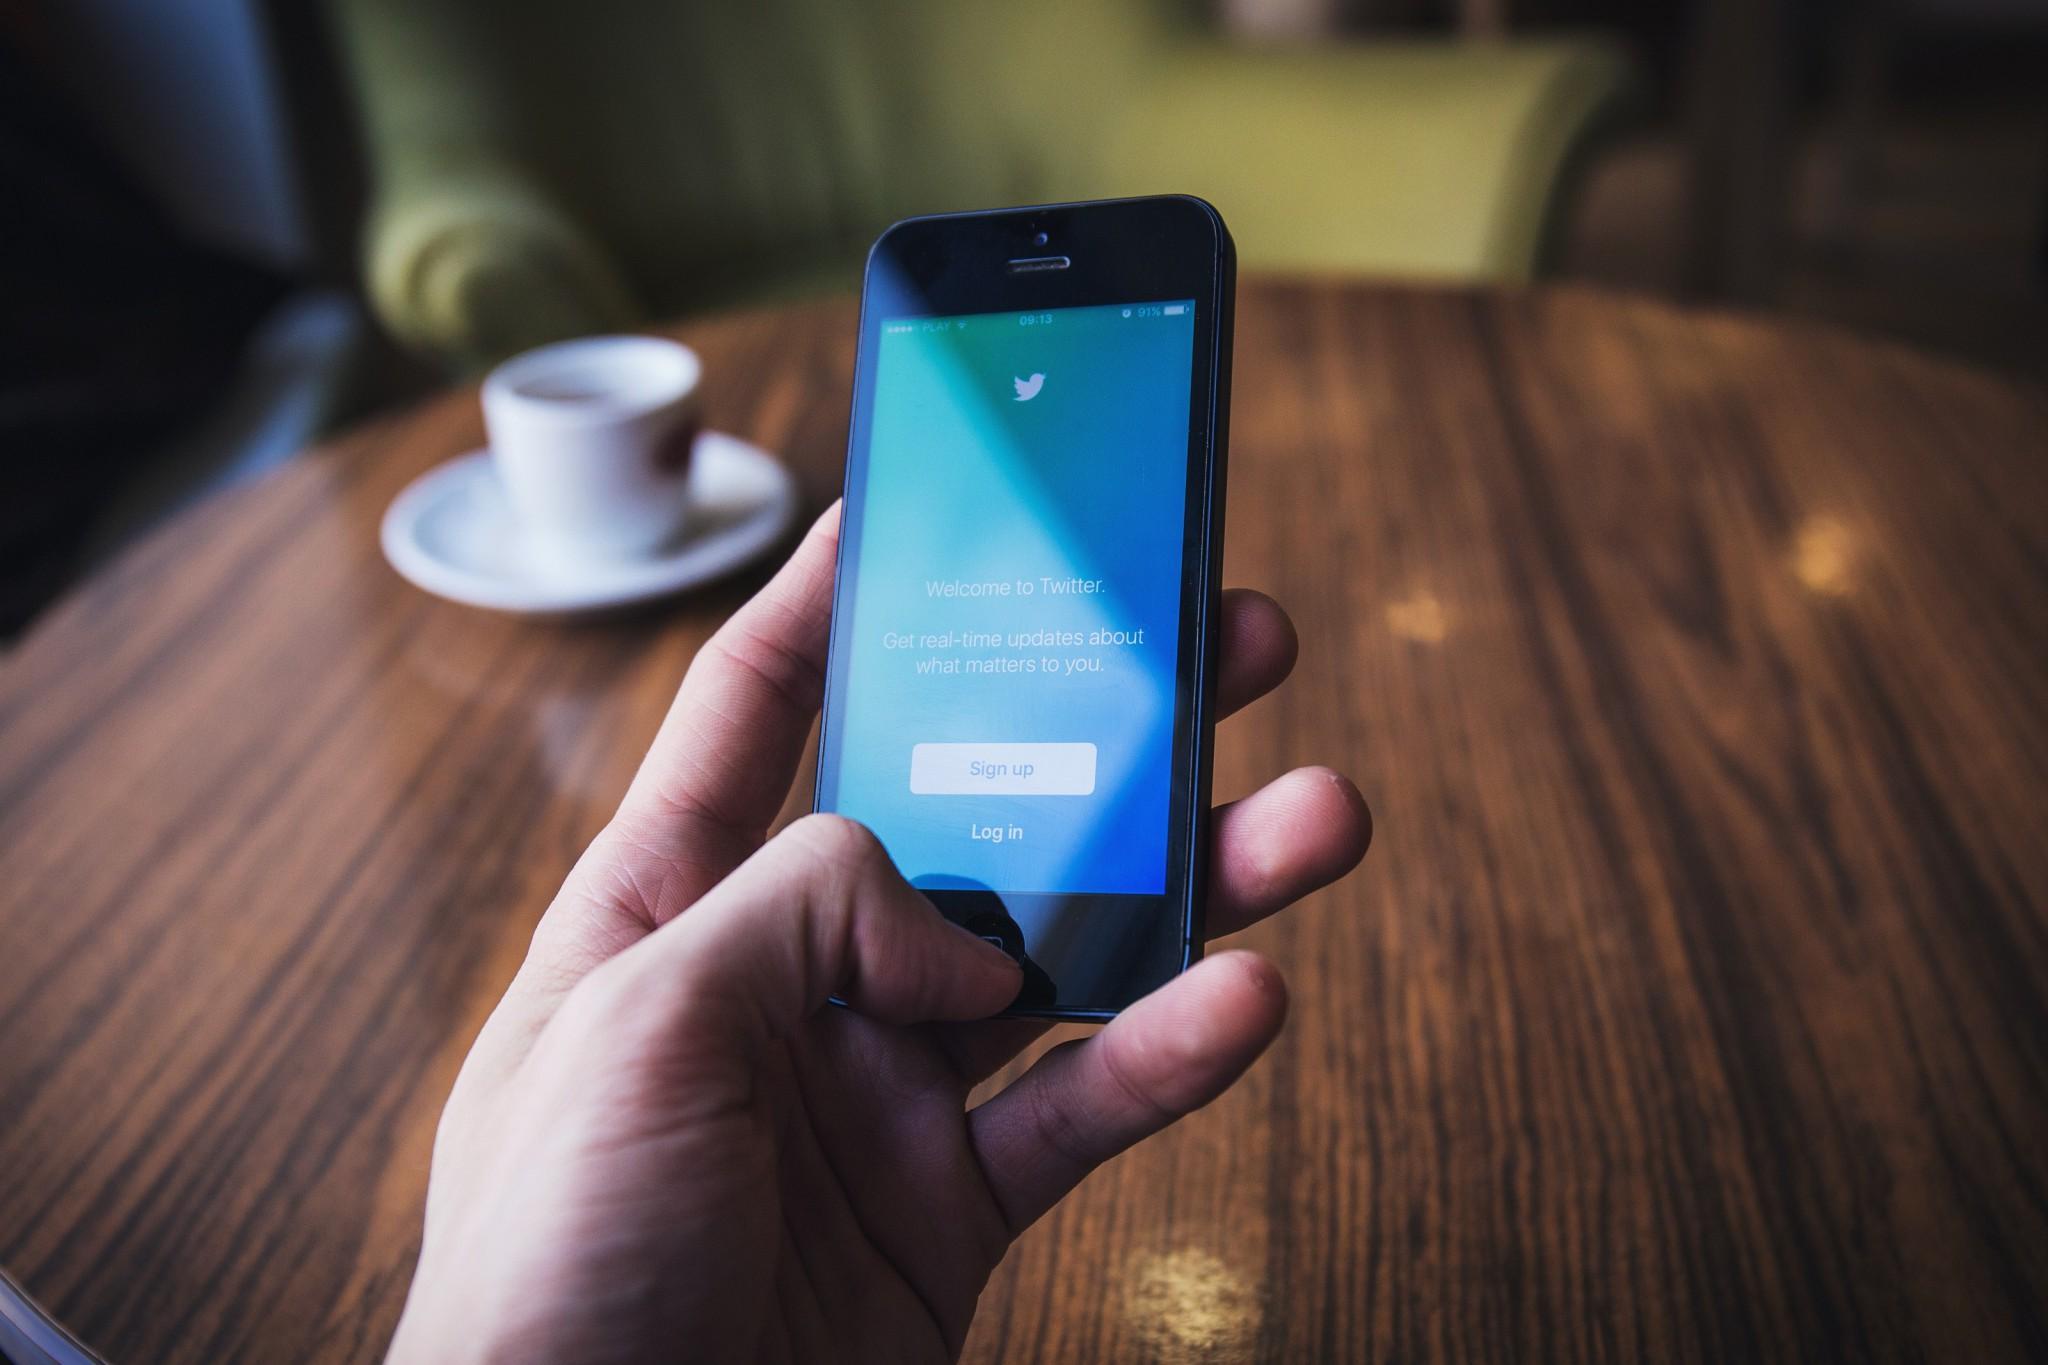 Una mano tiene un cellulare con l'app di twitter durante un live tweeting